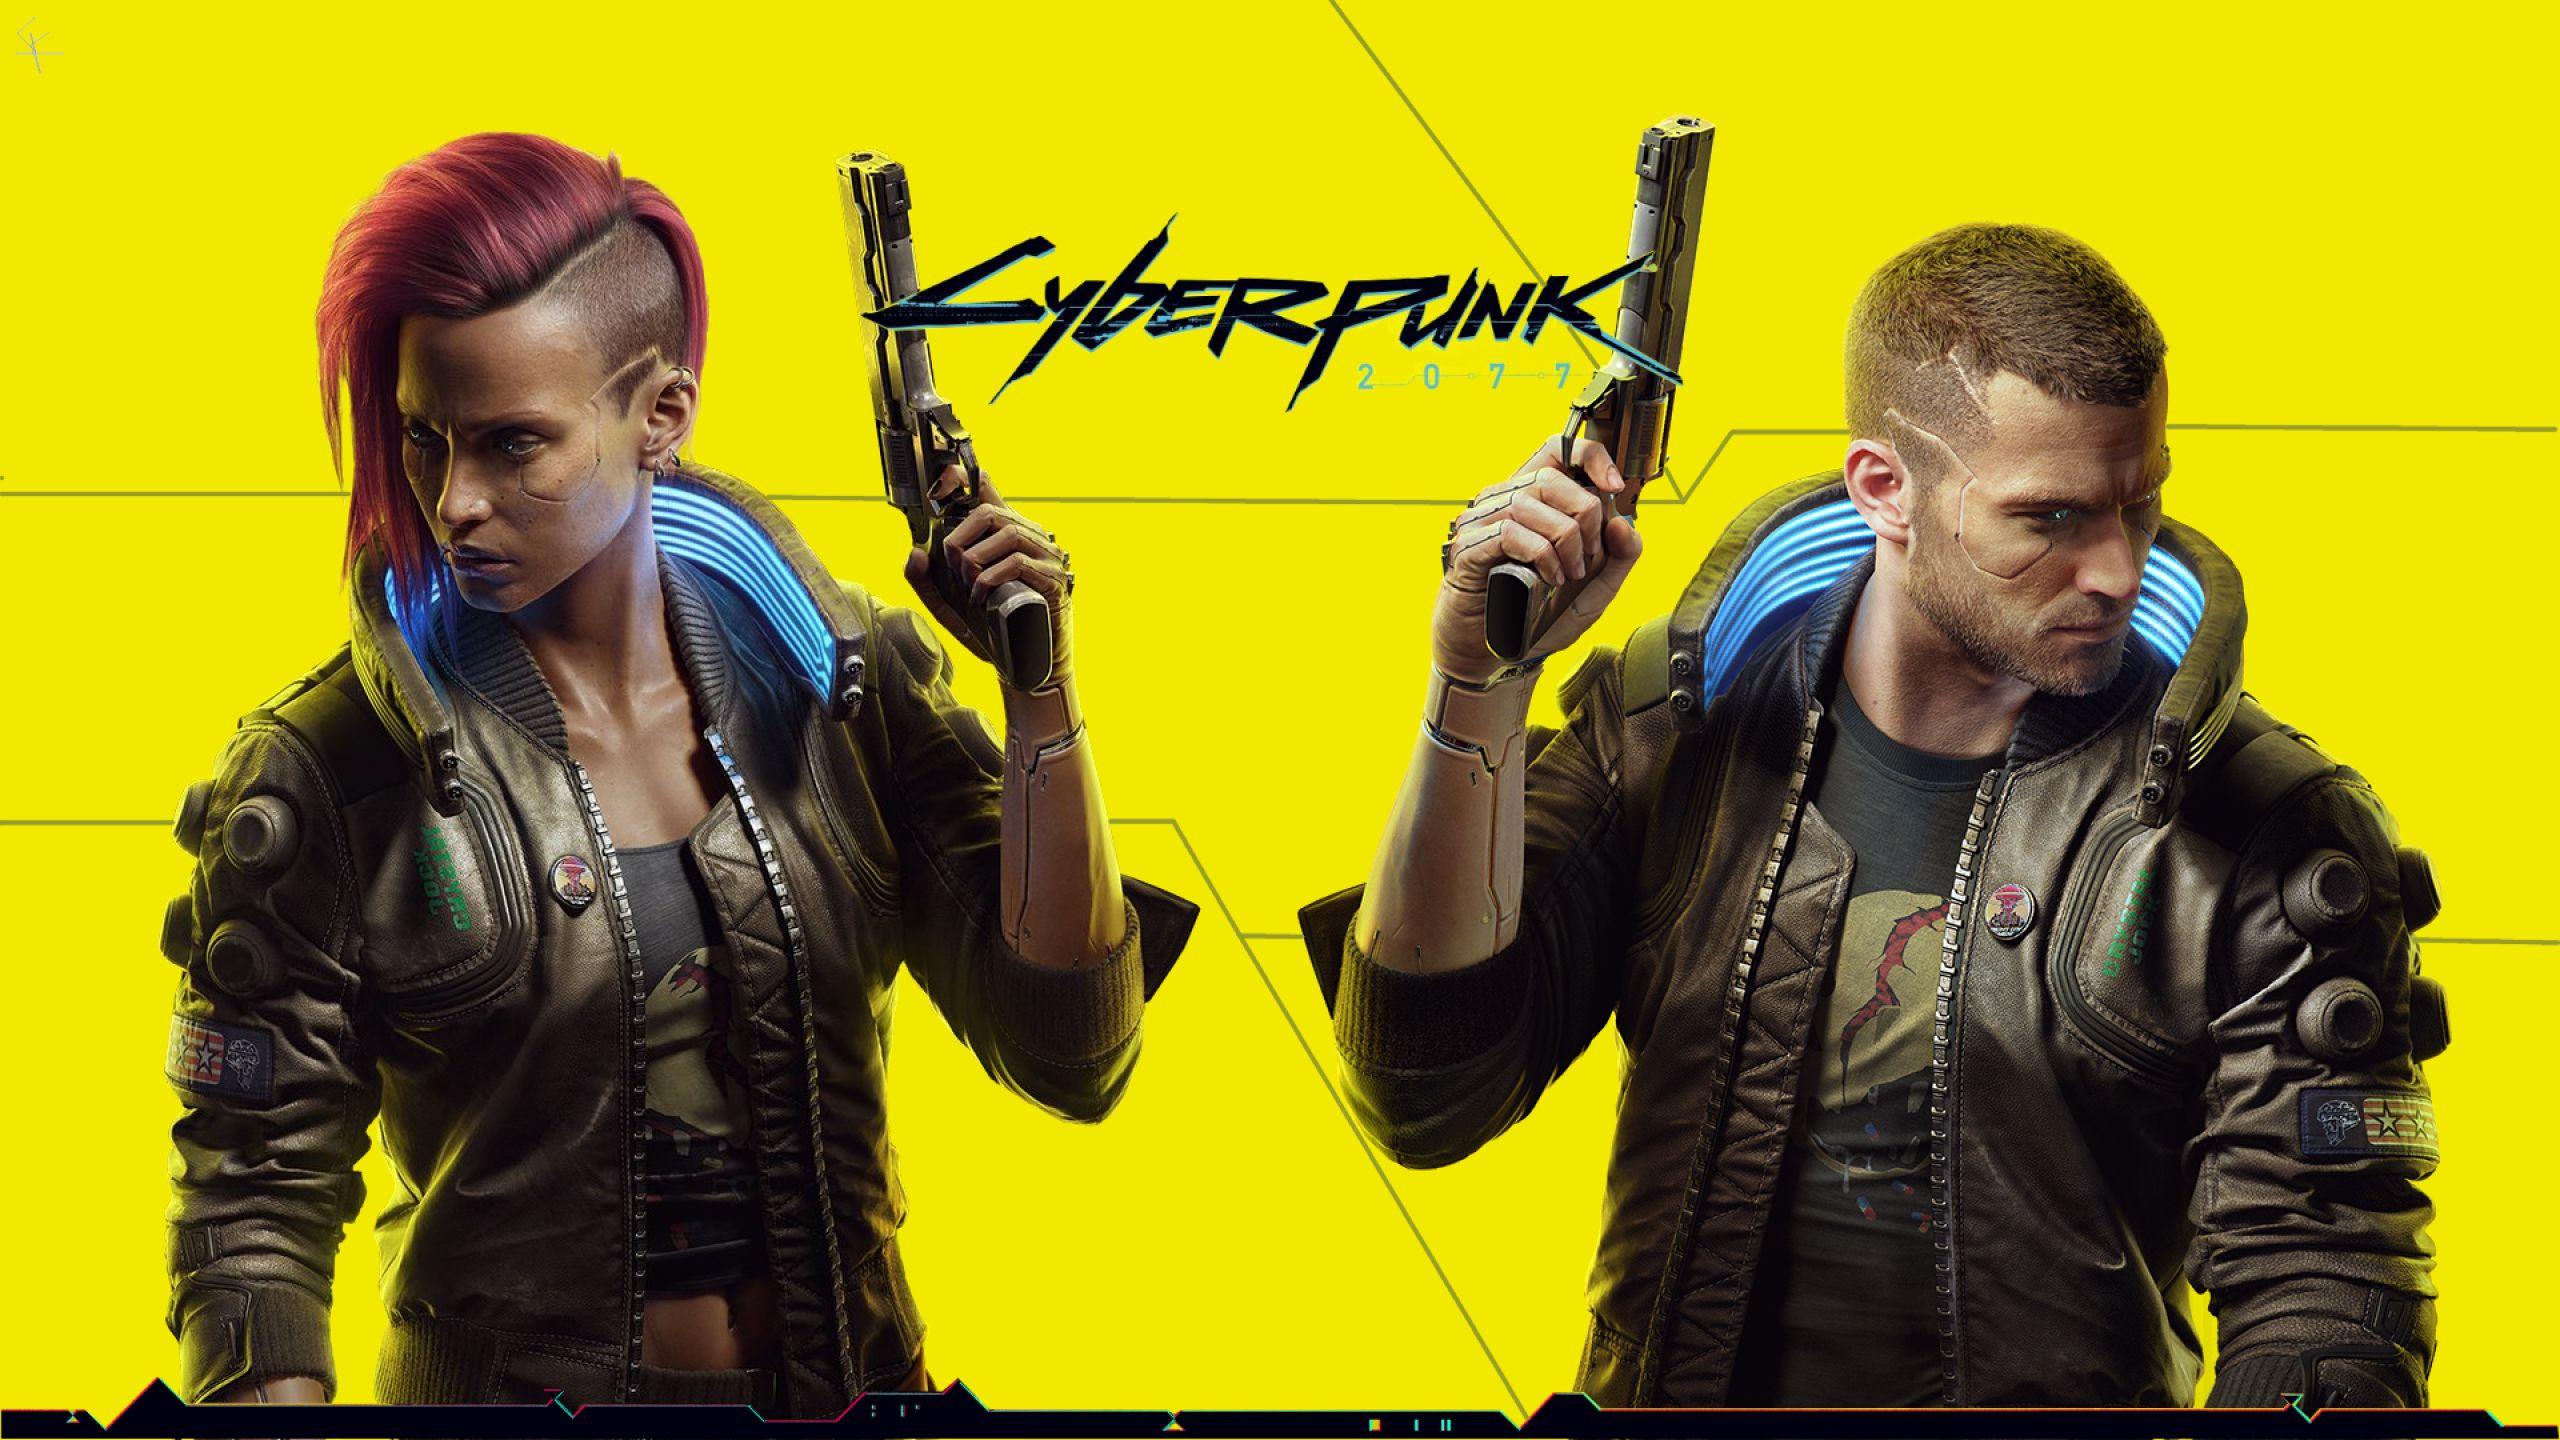 Cyberpunk 2077 – Gamers Opinion